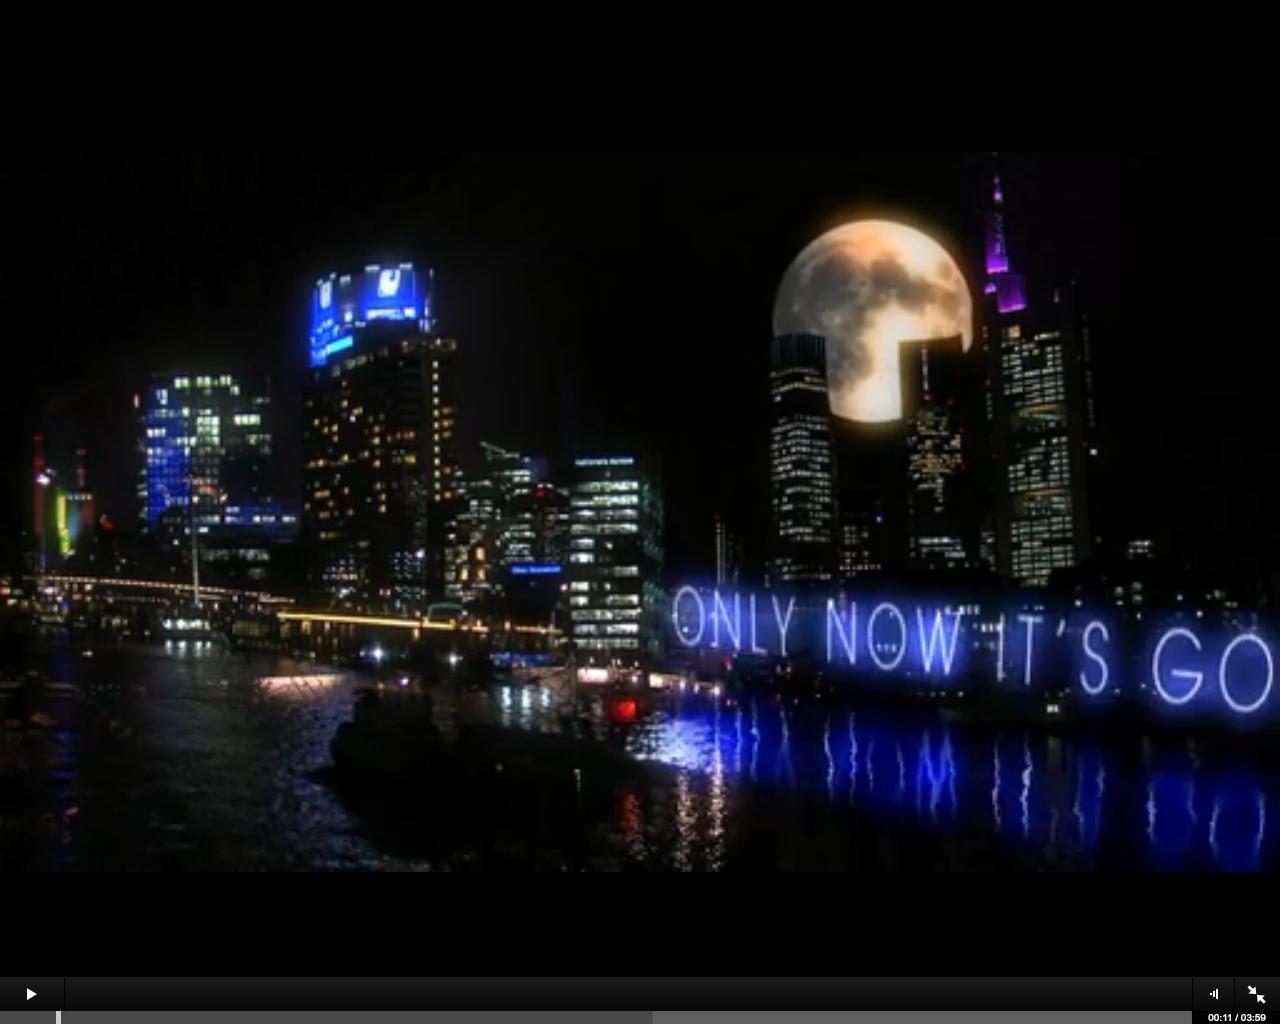 Lyric Video | End of Night